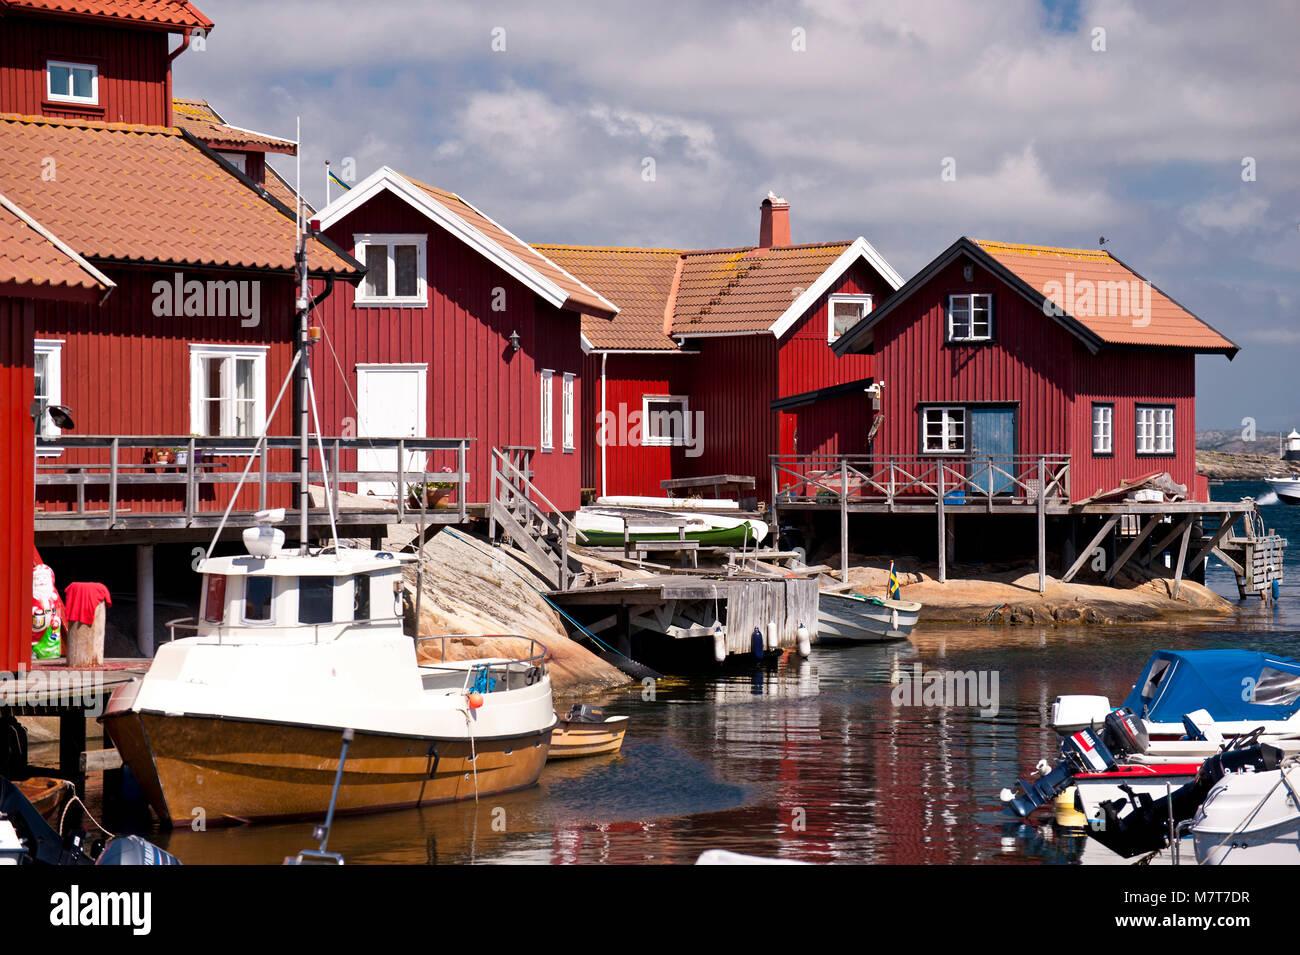 Kaeringoen, Sweden Stock Photo